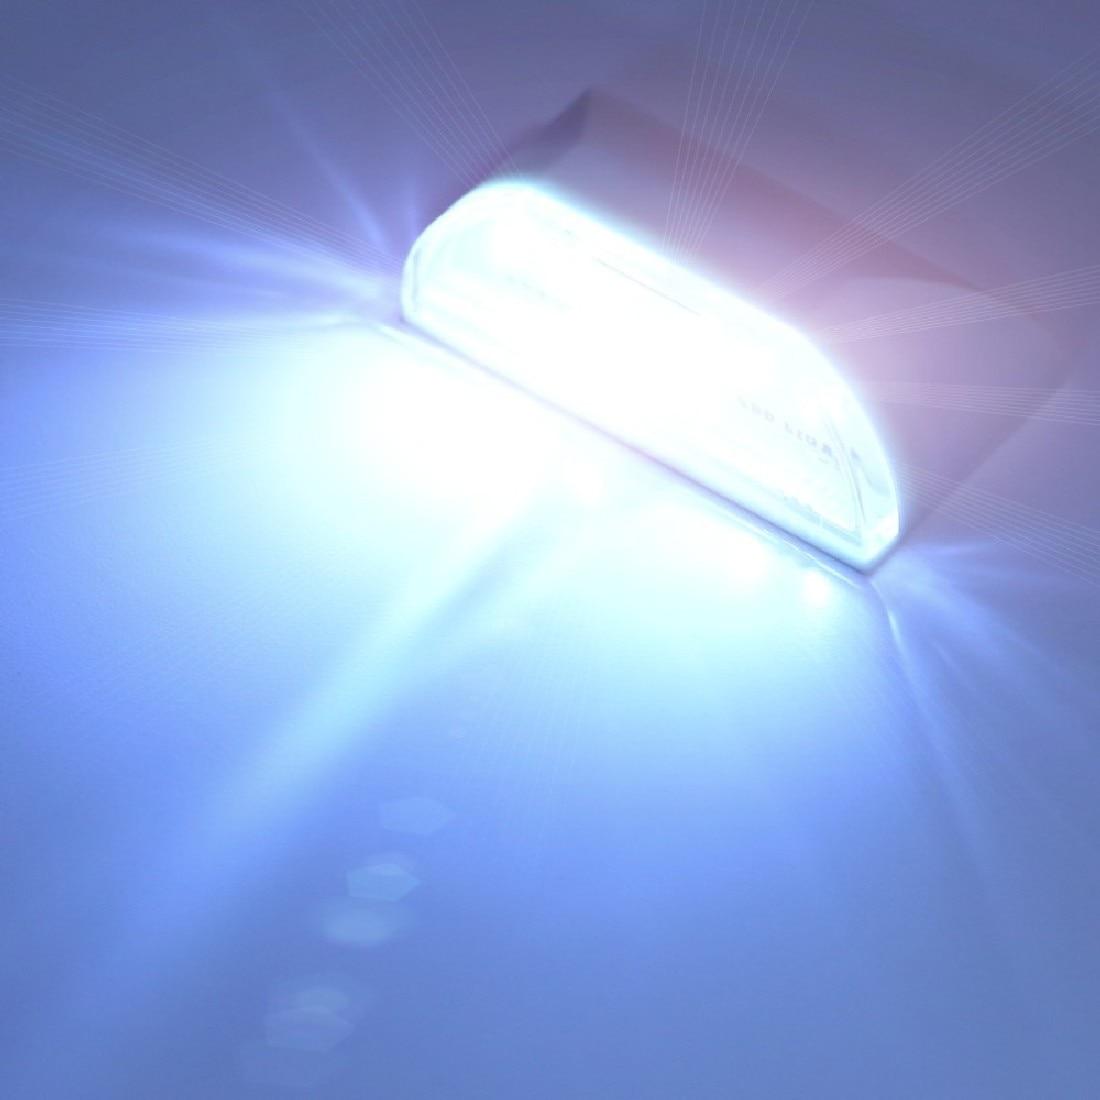 1Pcs Wireless Auto Infrared Sensor Motion Detector Keyhole 4 LED Light Lamp Night Lights Motion Light Ambient Light Sensor